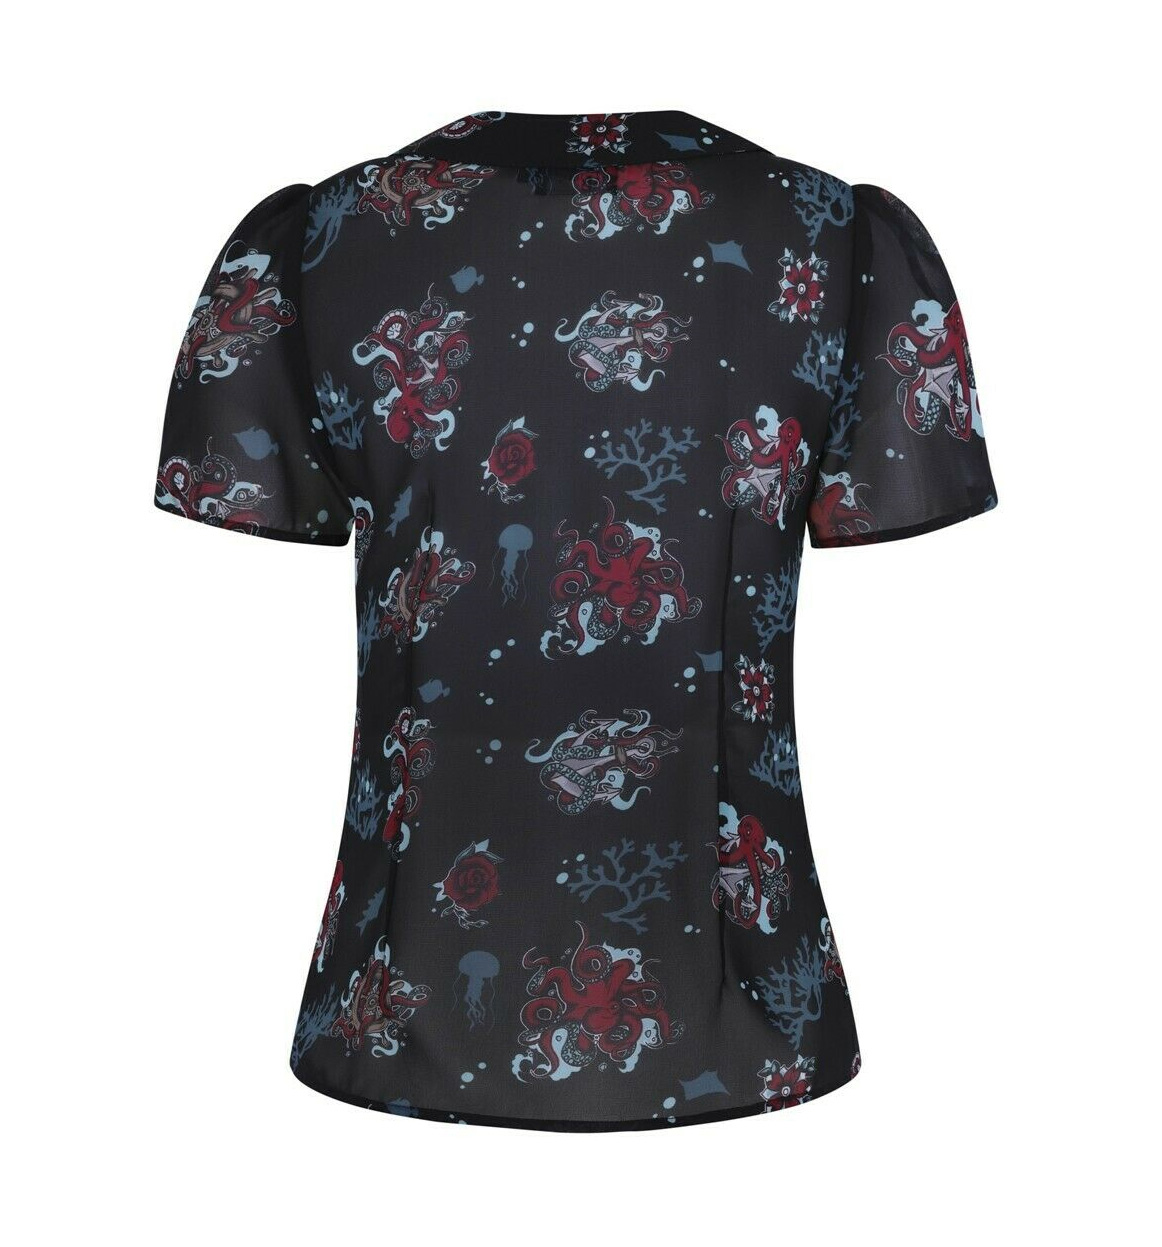 Hell-Bunny-50s-Shirt-Top-Black-Ocean-Octopus-Roses-POSEIDON-Blouse-All-Sizes thumbnail 43